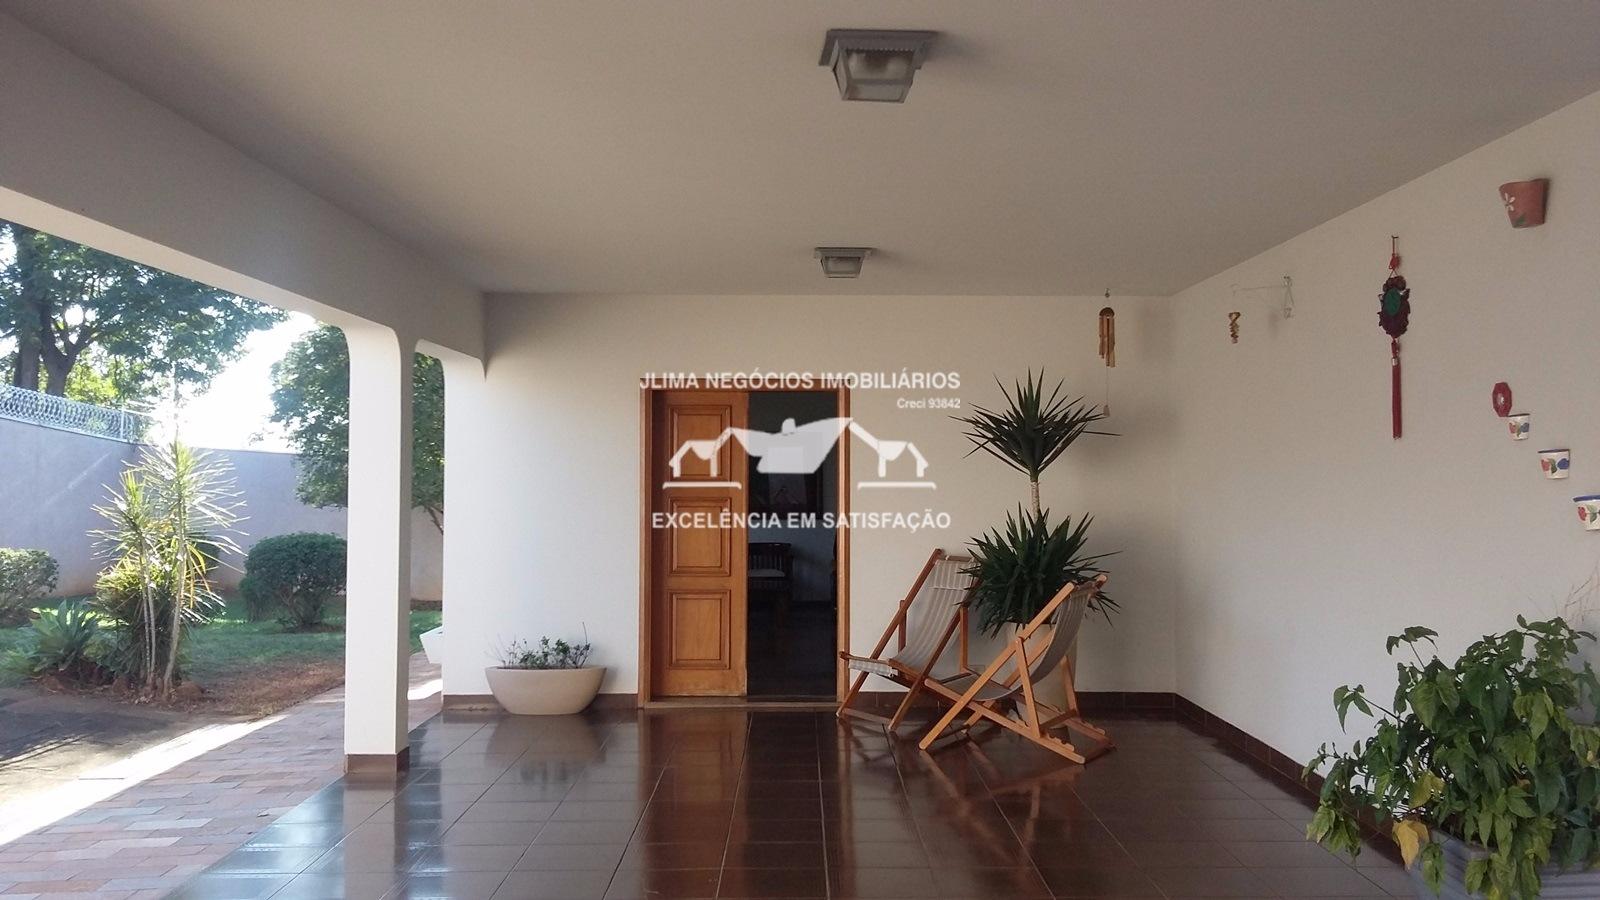 Venda                                                            - Chácara                                                            - Jardim Paulistano                                                                - Americana                                                                /SP